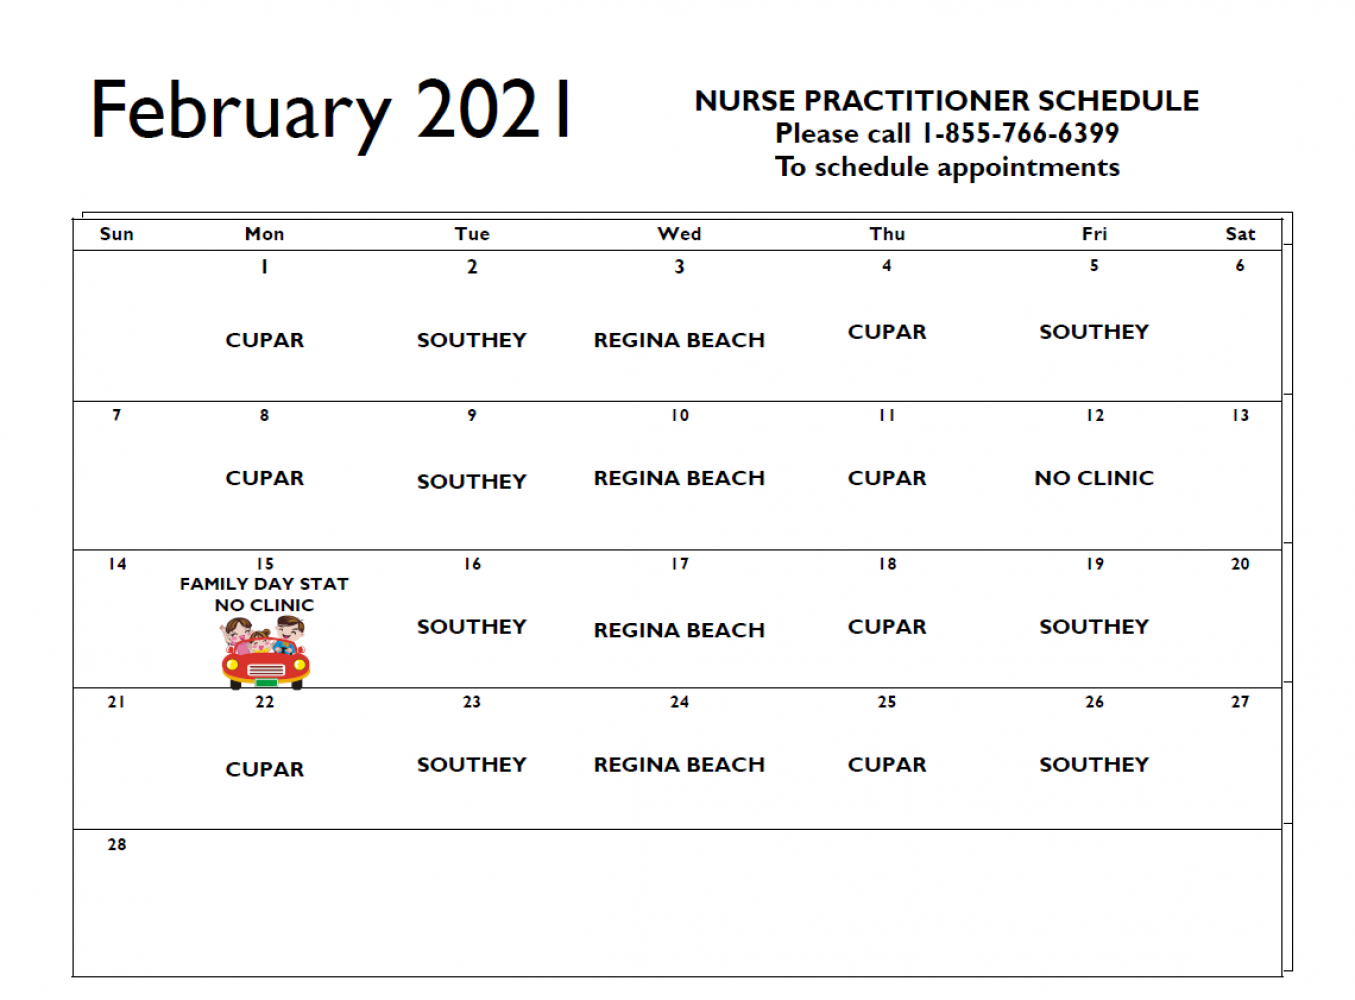 February Nurse Practitioner Schedule